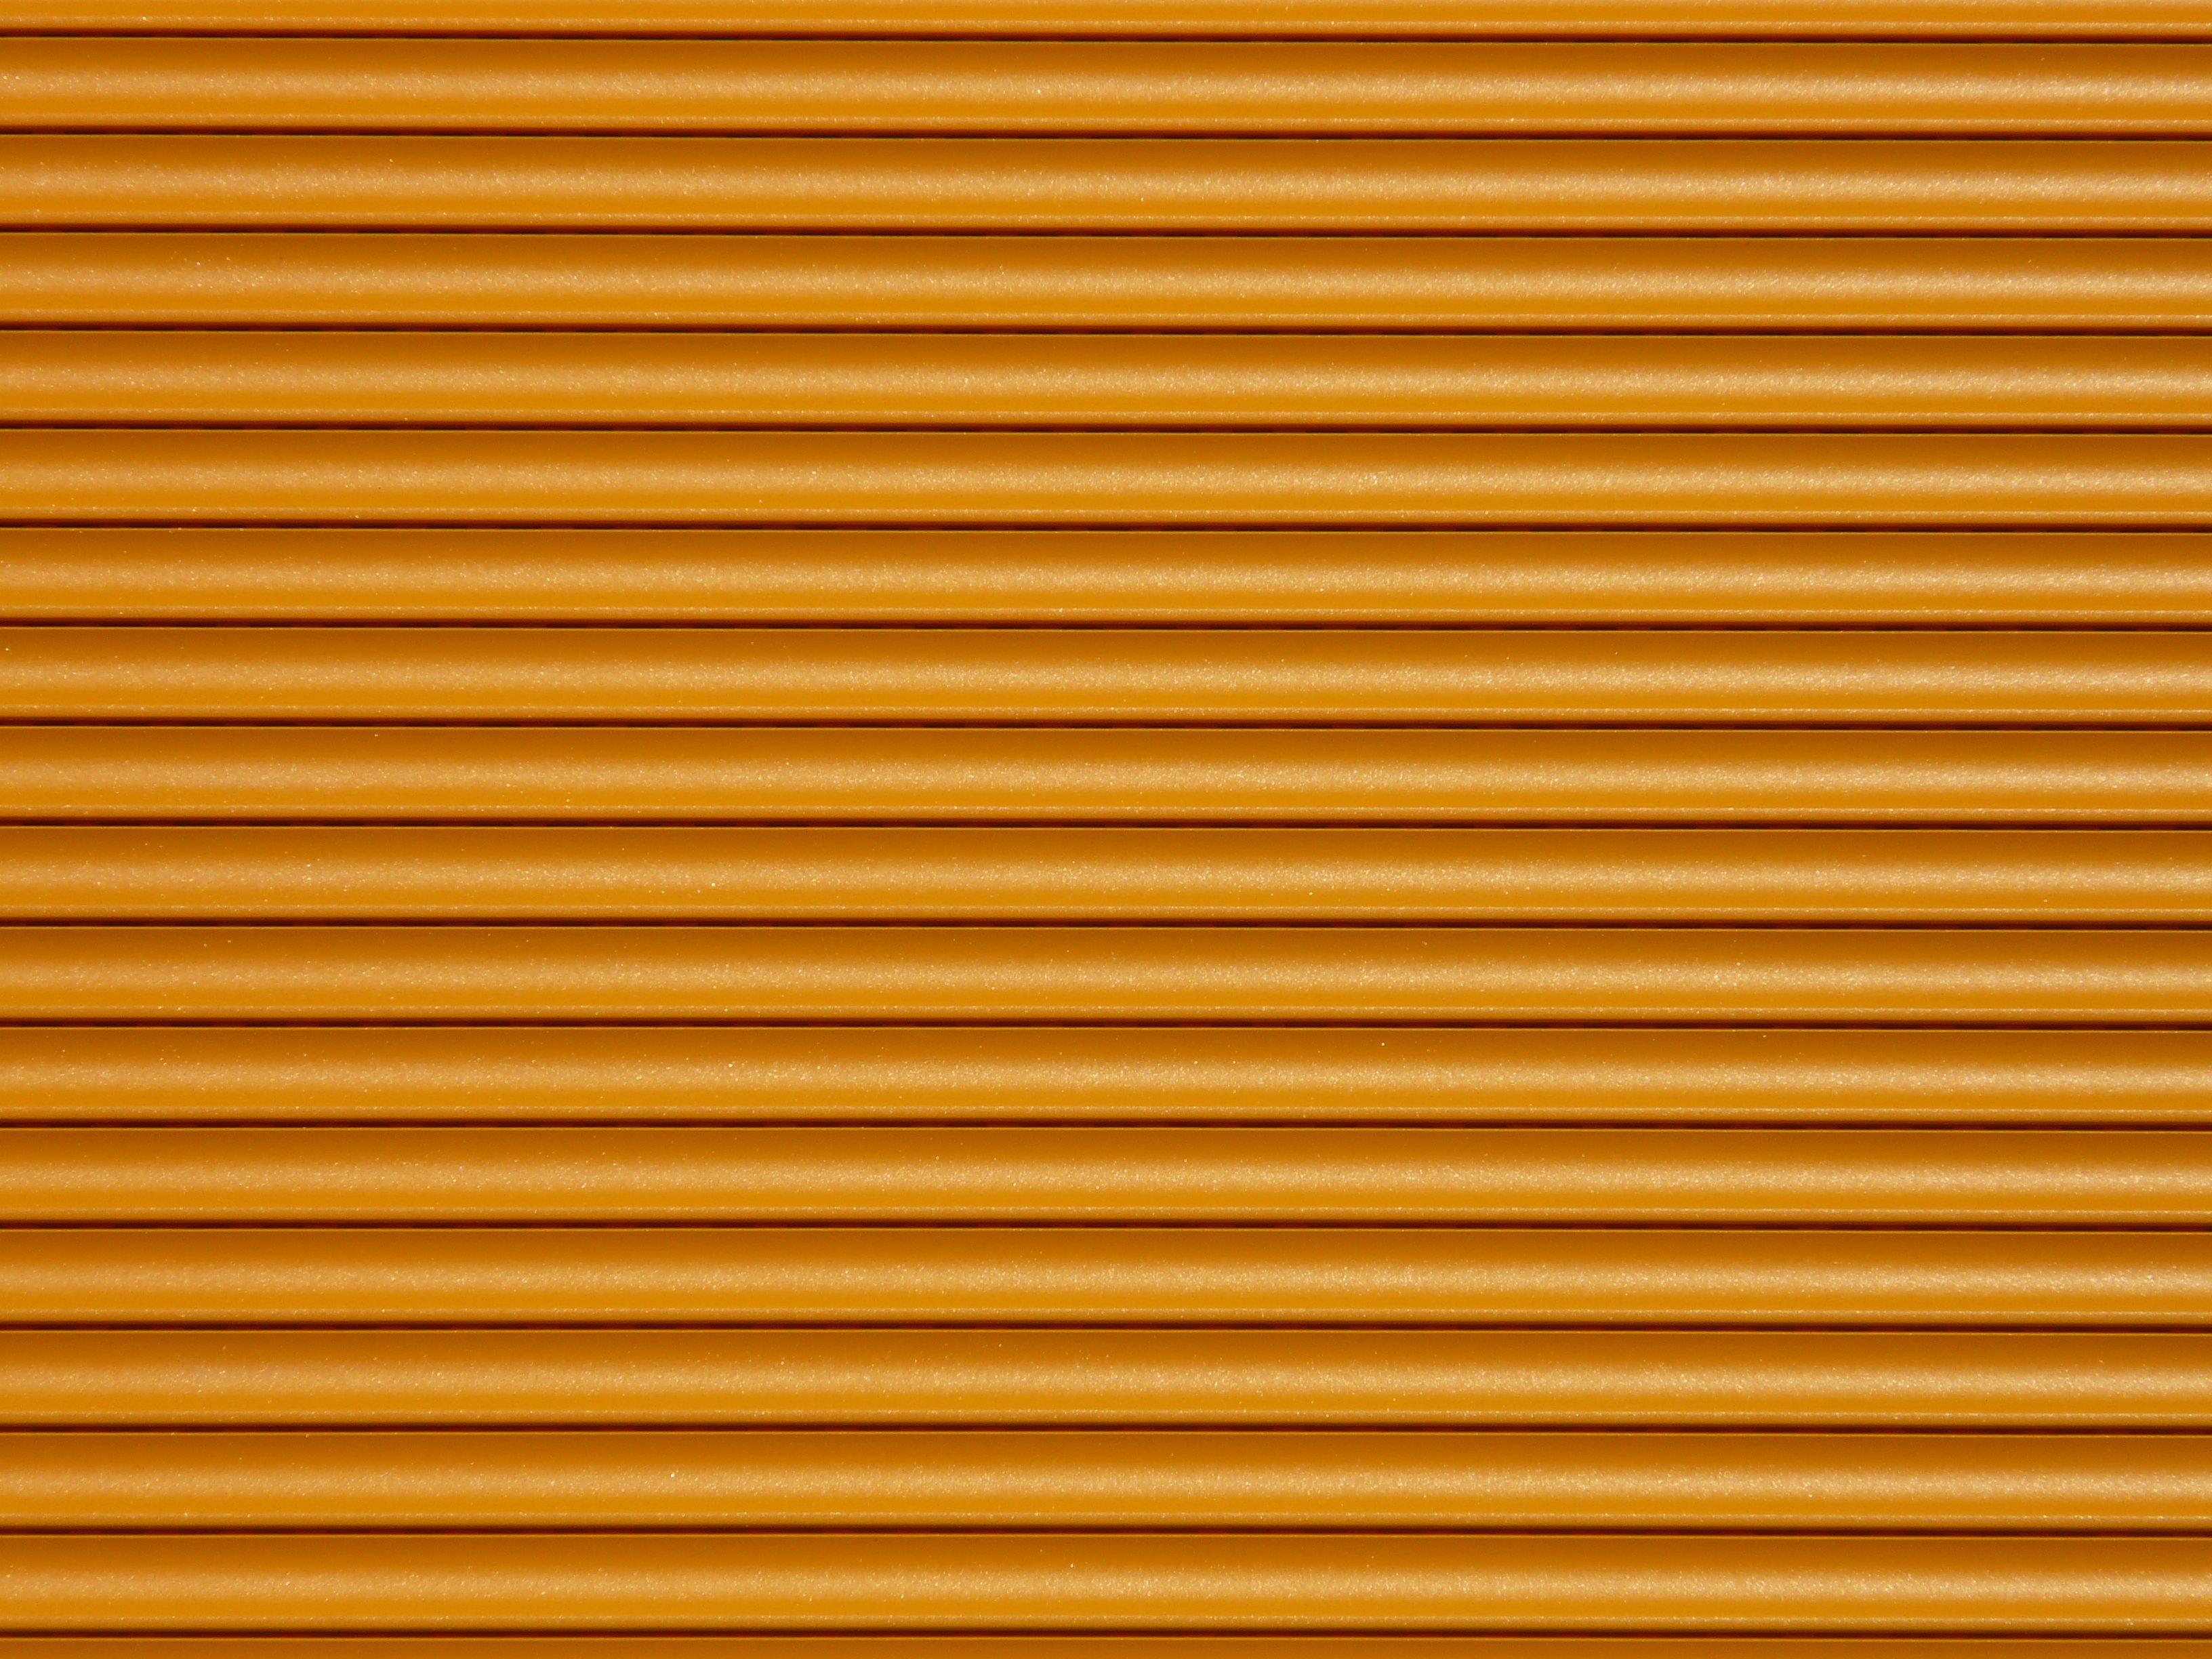 Fotos Gratis Textura Piso Naranja Patr 243 N L 237 Nea